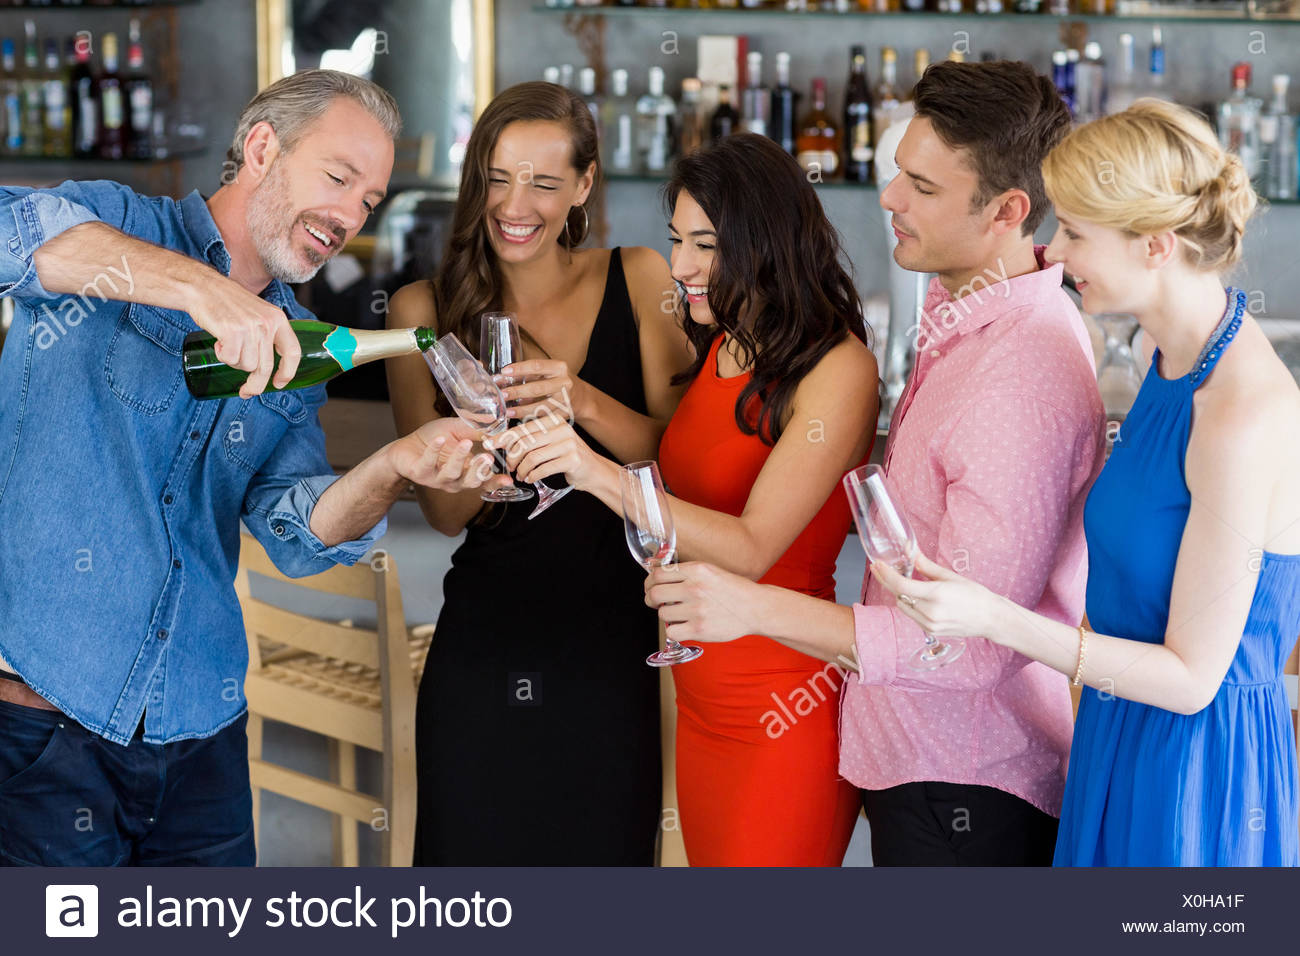 Hombre verter en el vaso de champagne Imagen De Stock